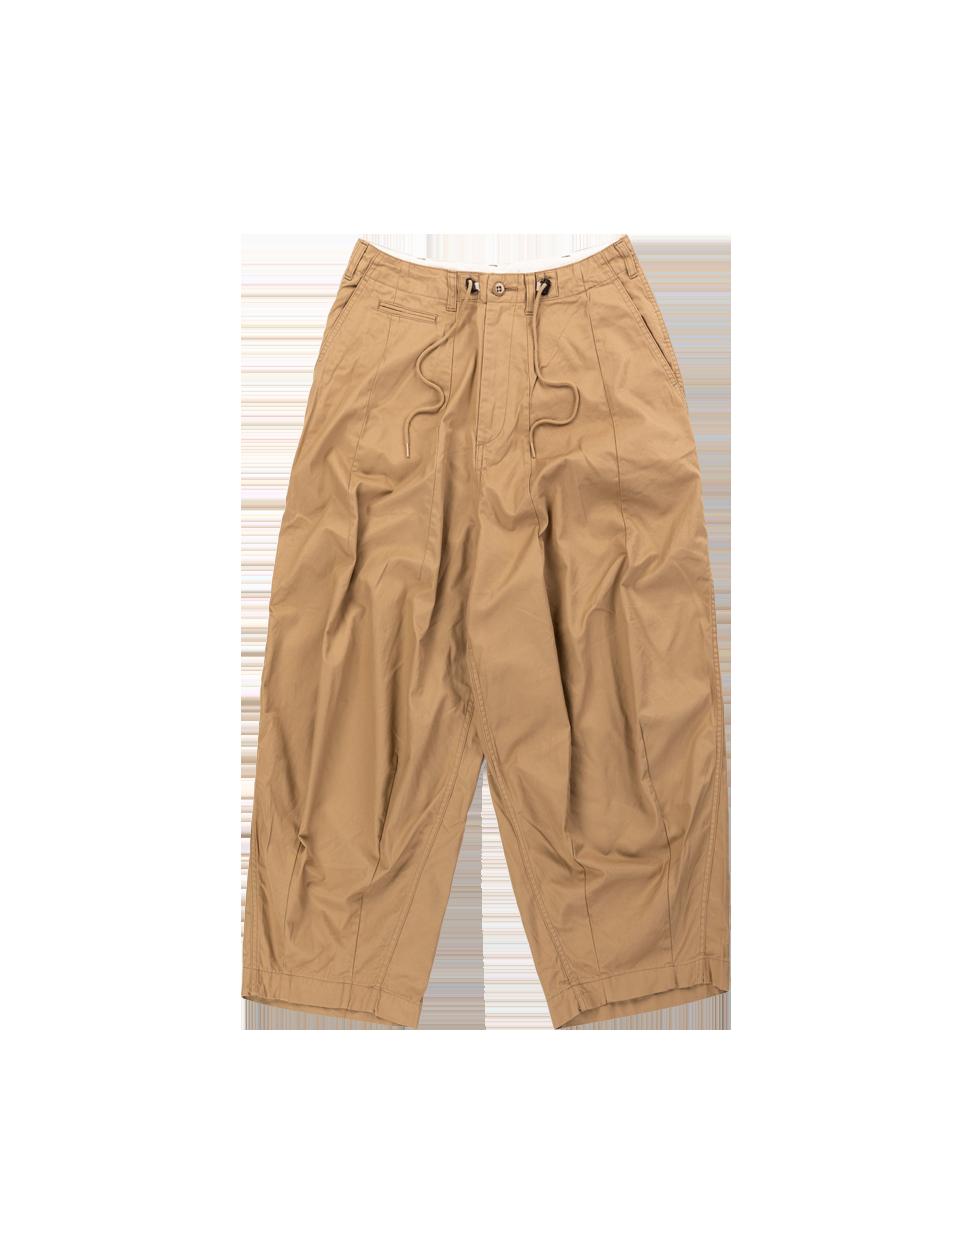 Needles Military HD Pants